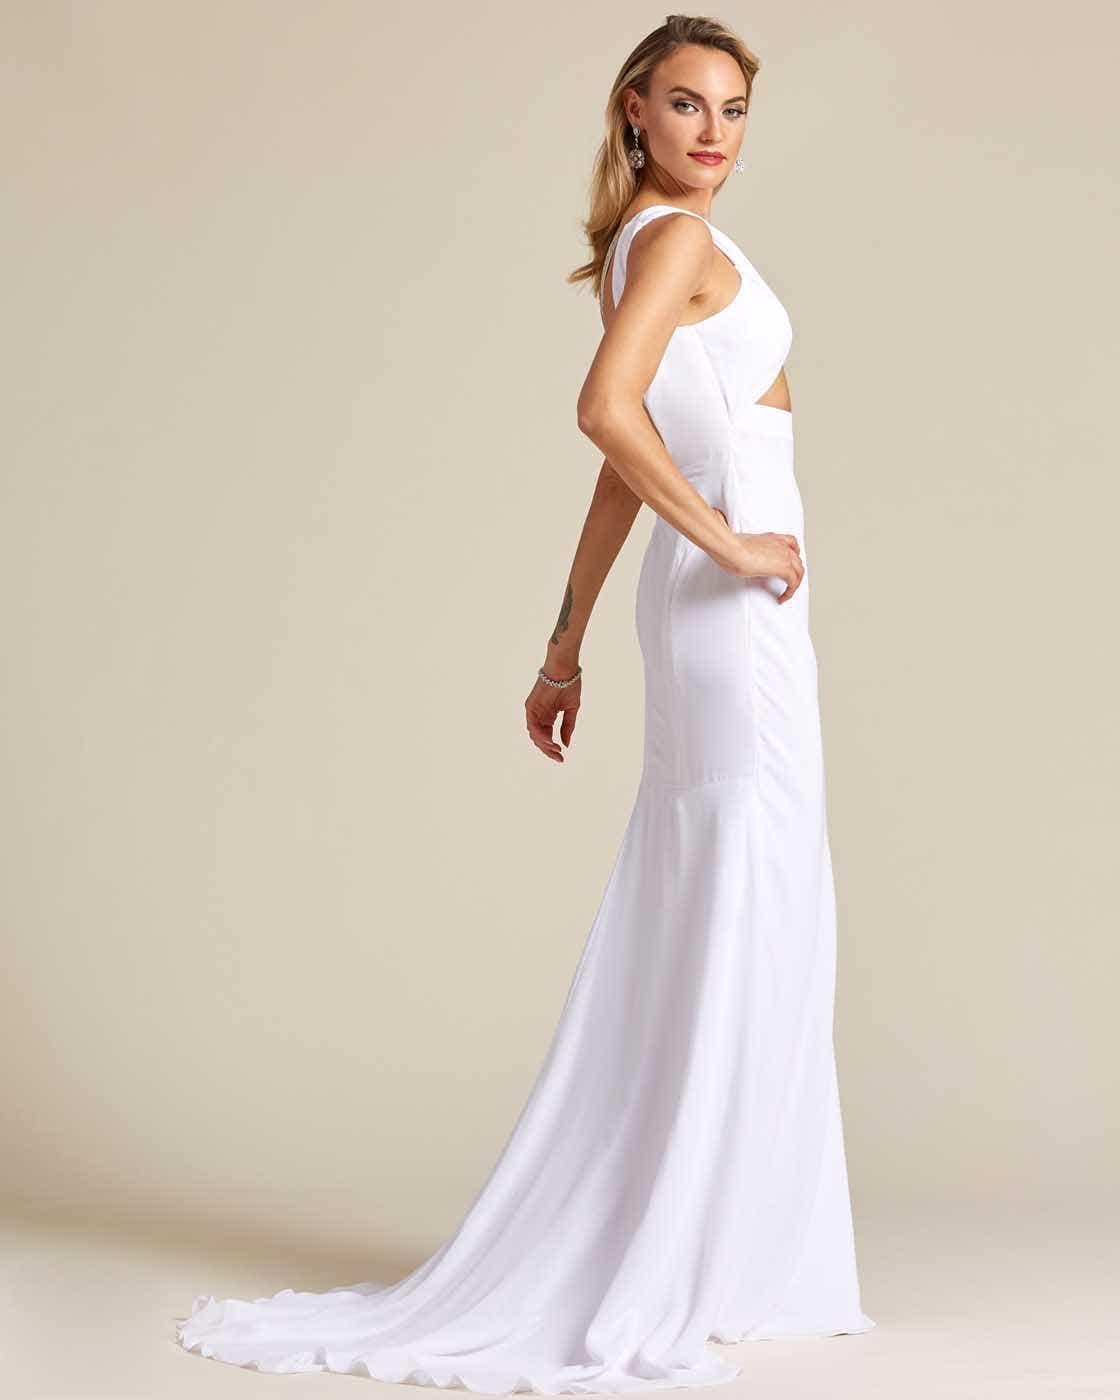 Ivory White Criss Cross Wedding Dress - Side